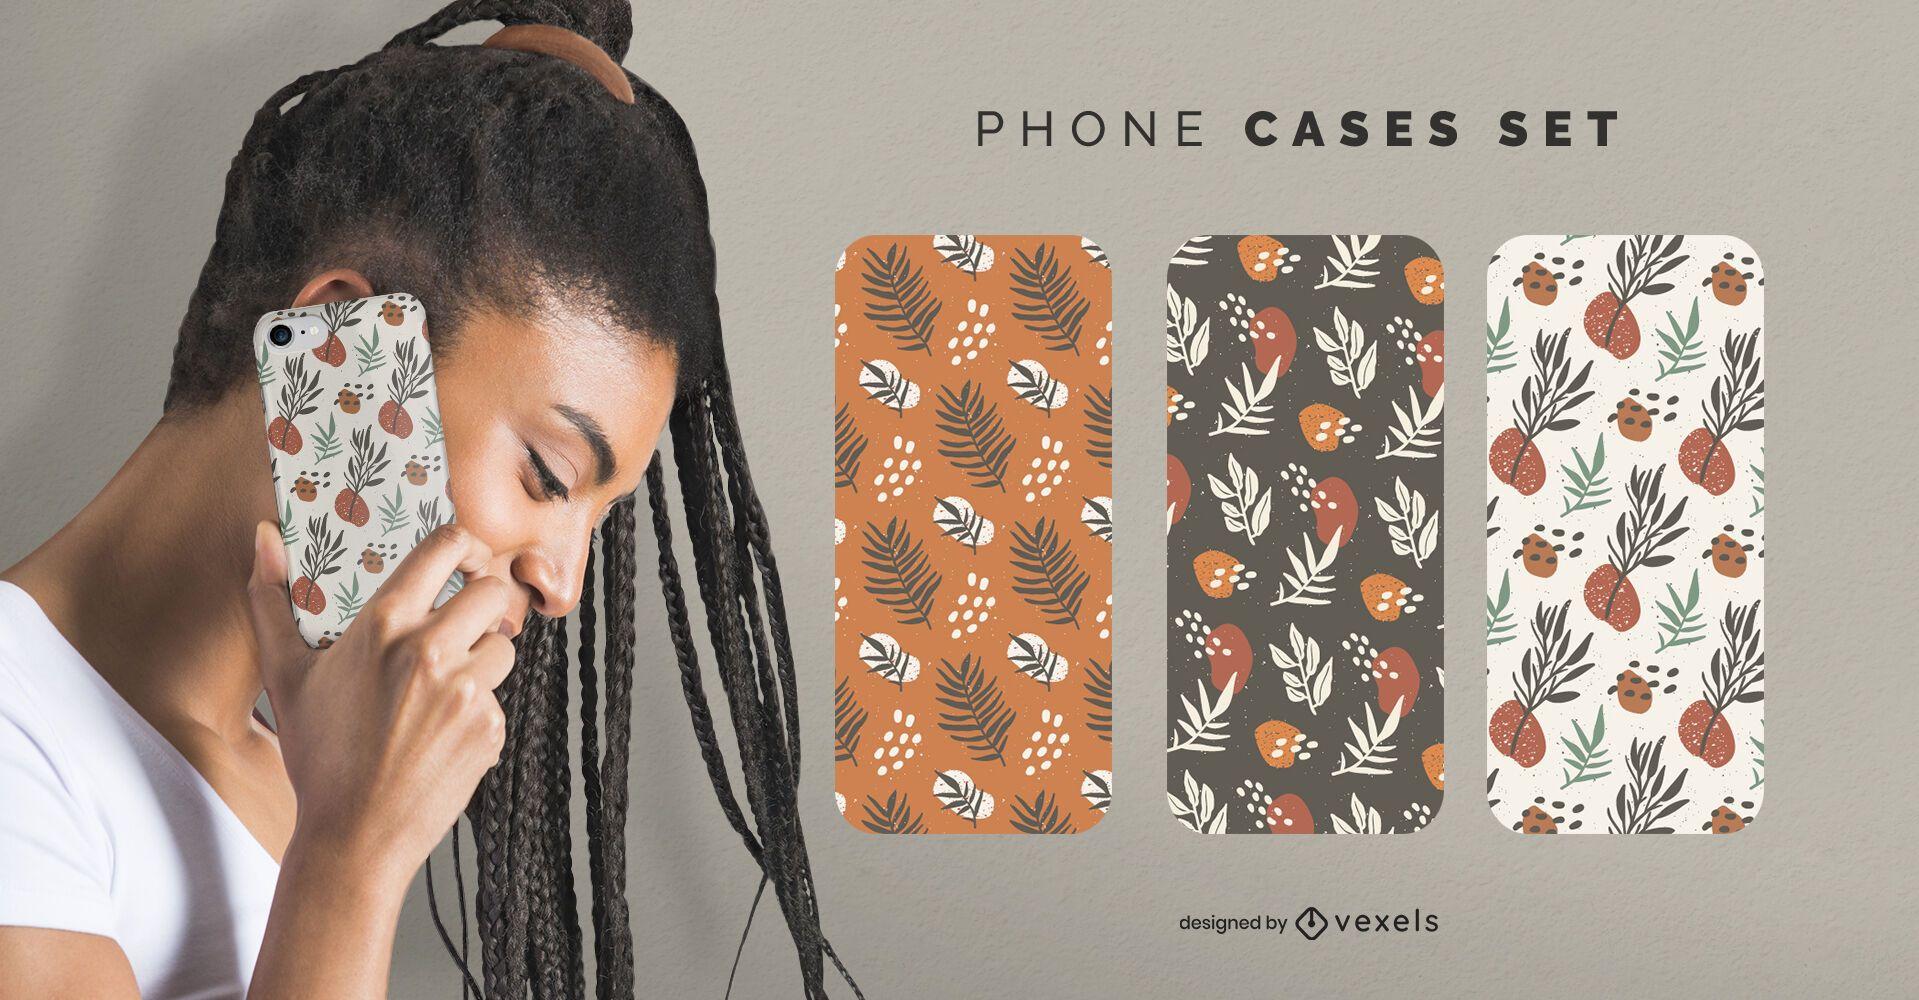 Deixa as capas de telefone definidas